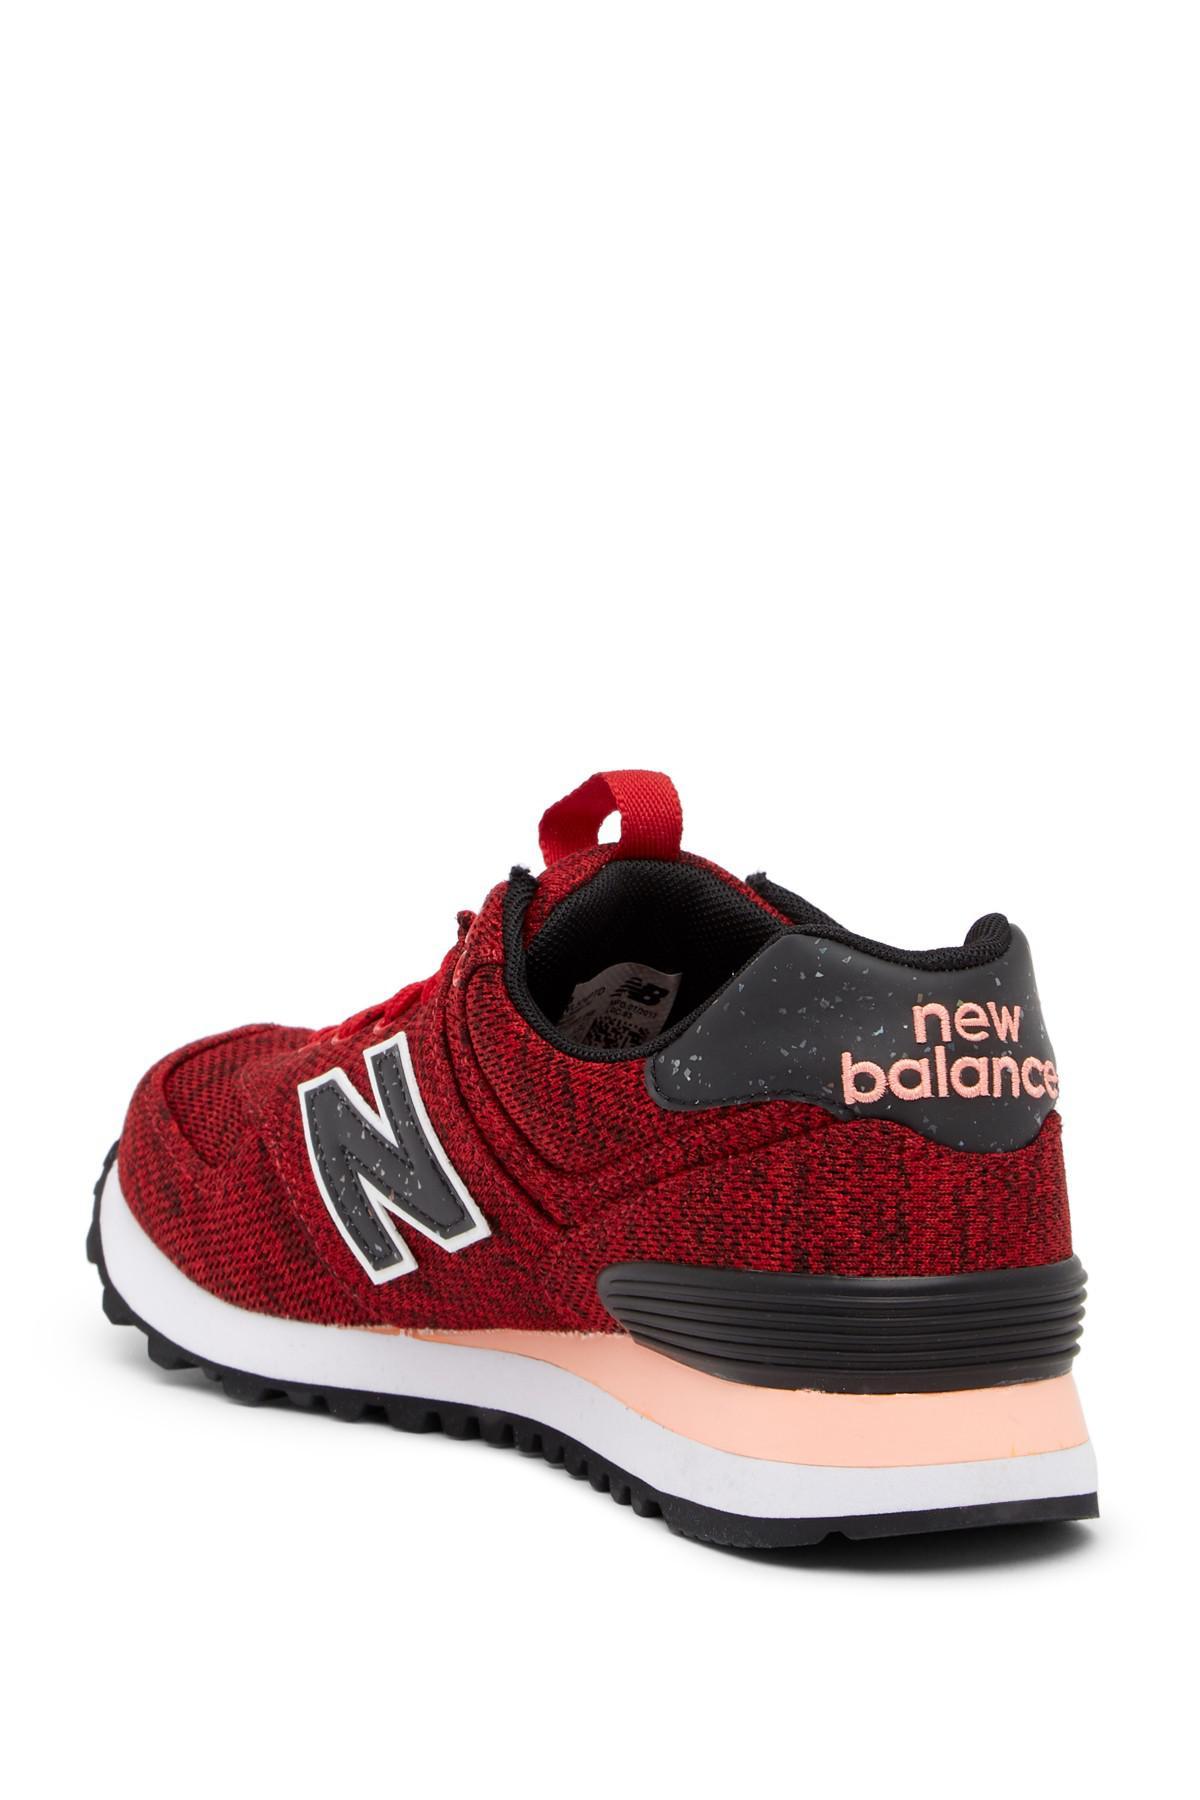 New Balance Q417 SRMC Sneaker jlRYRhjY